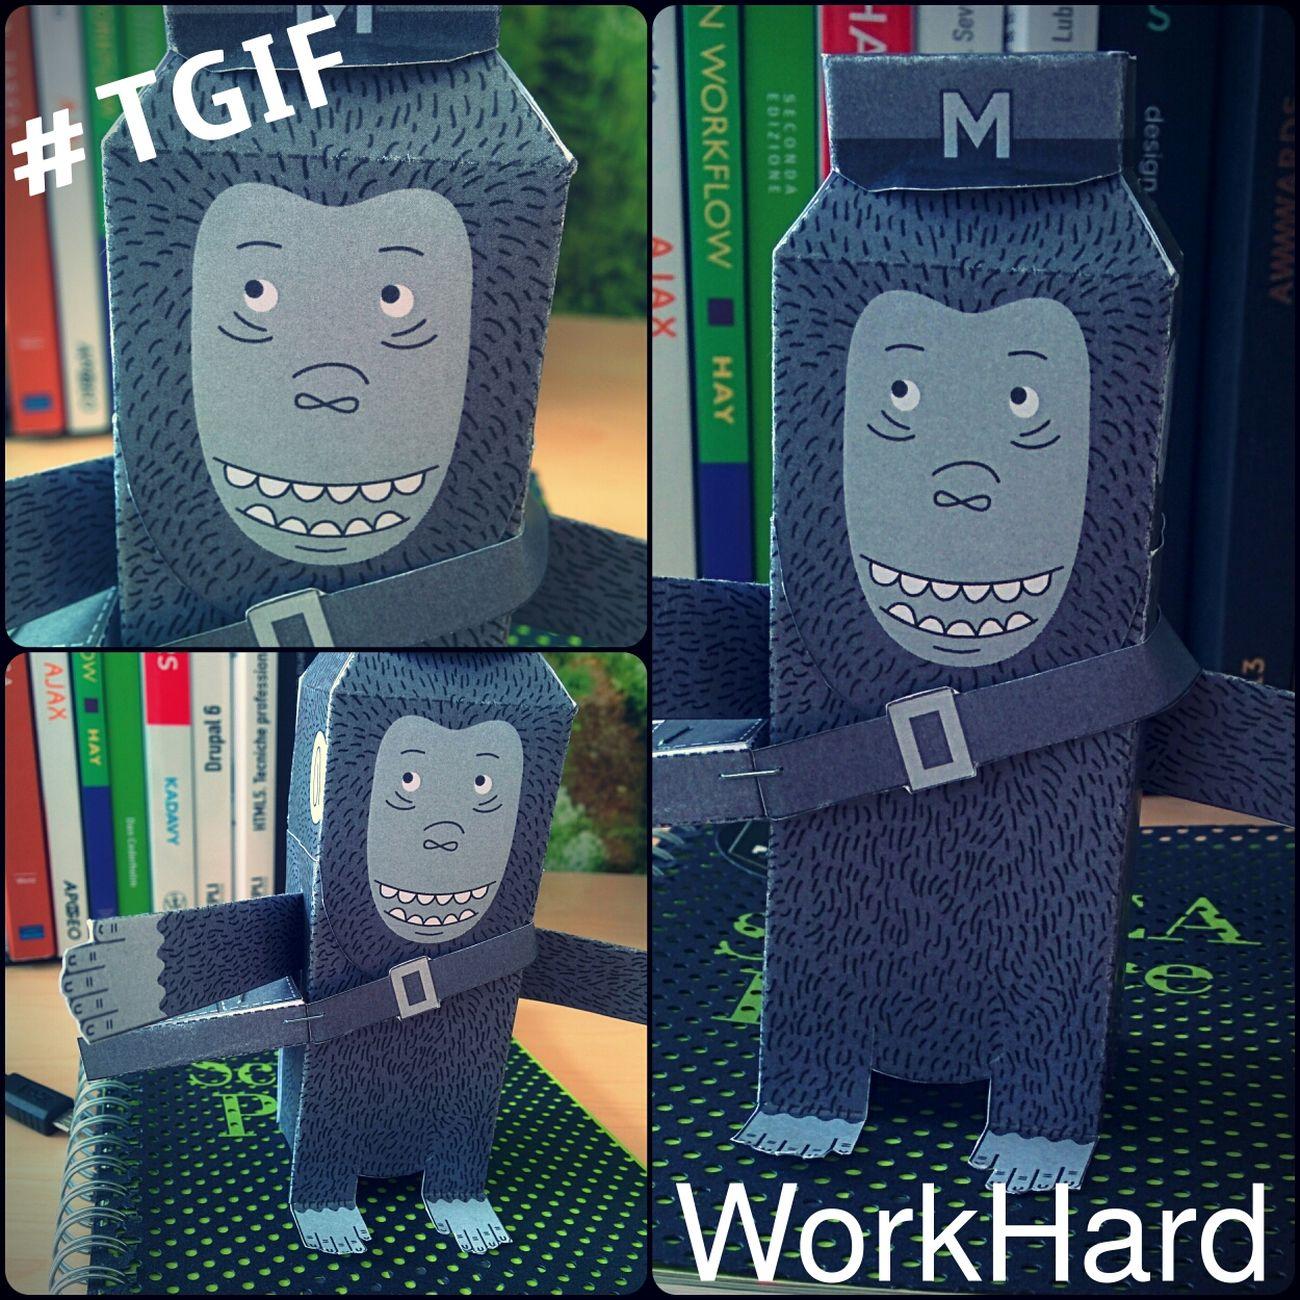 Codehard WORKHARD Tgif